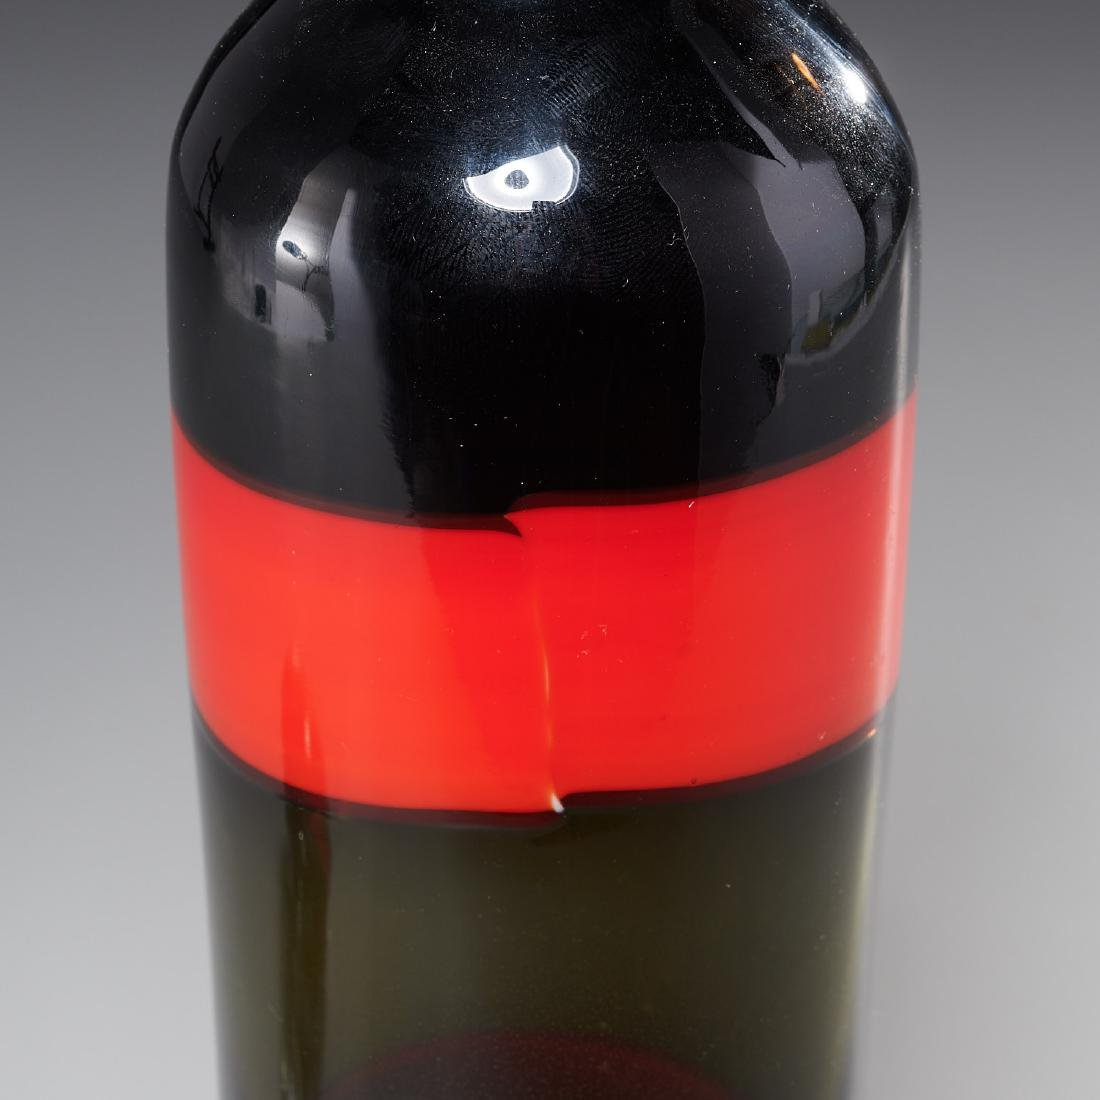 Fulvio Bianconi Fasce Orizzantale bottle - 3